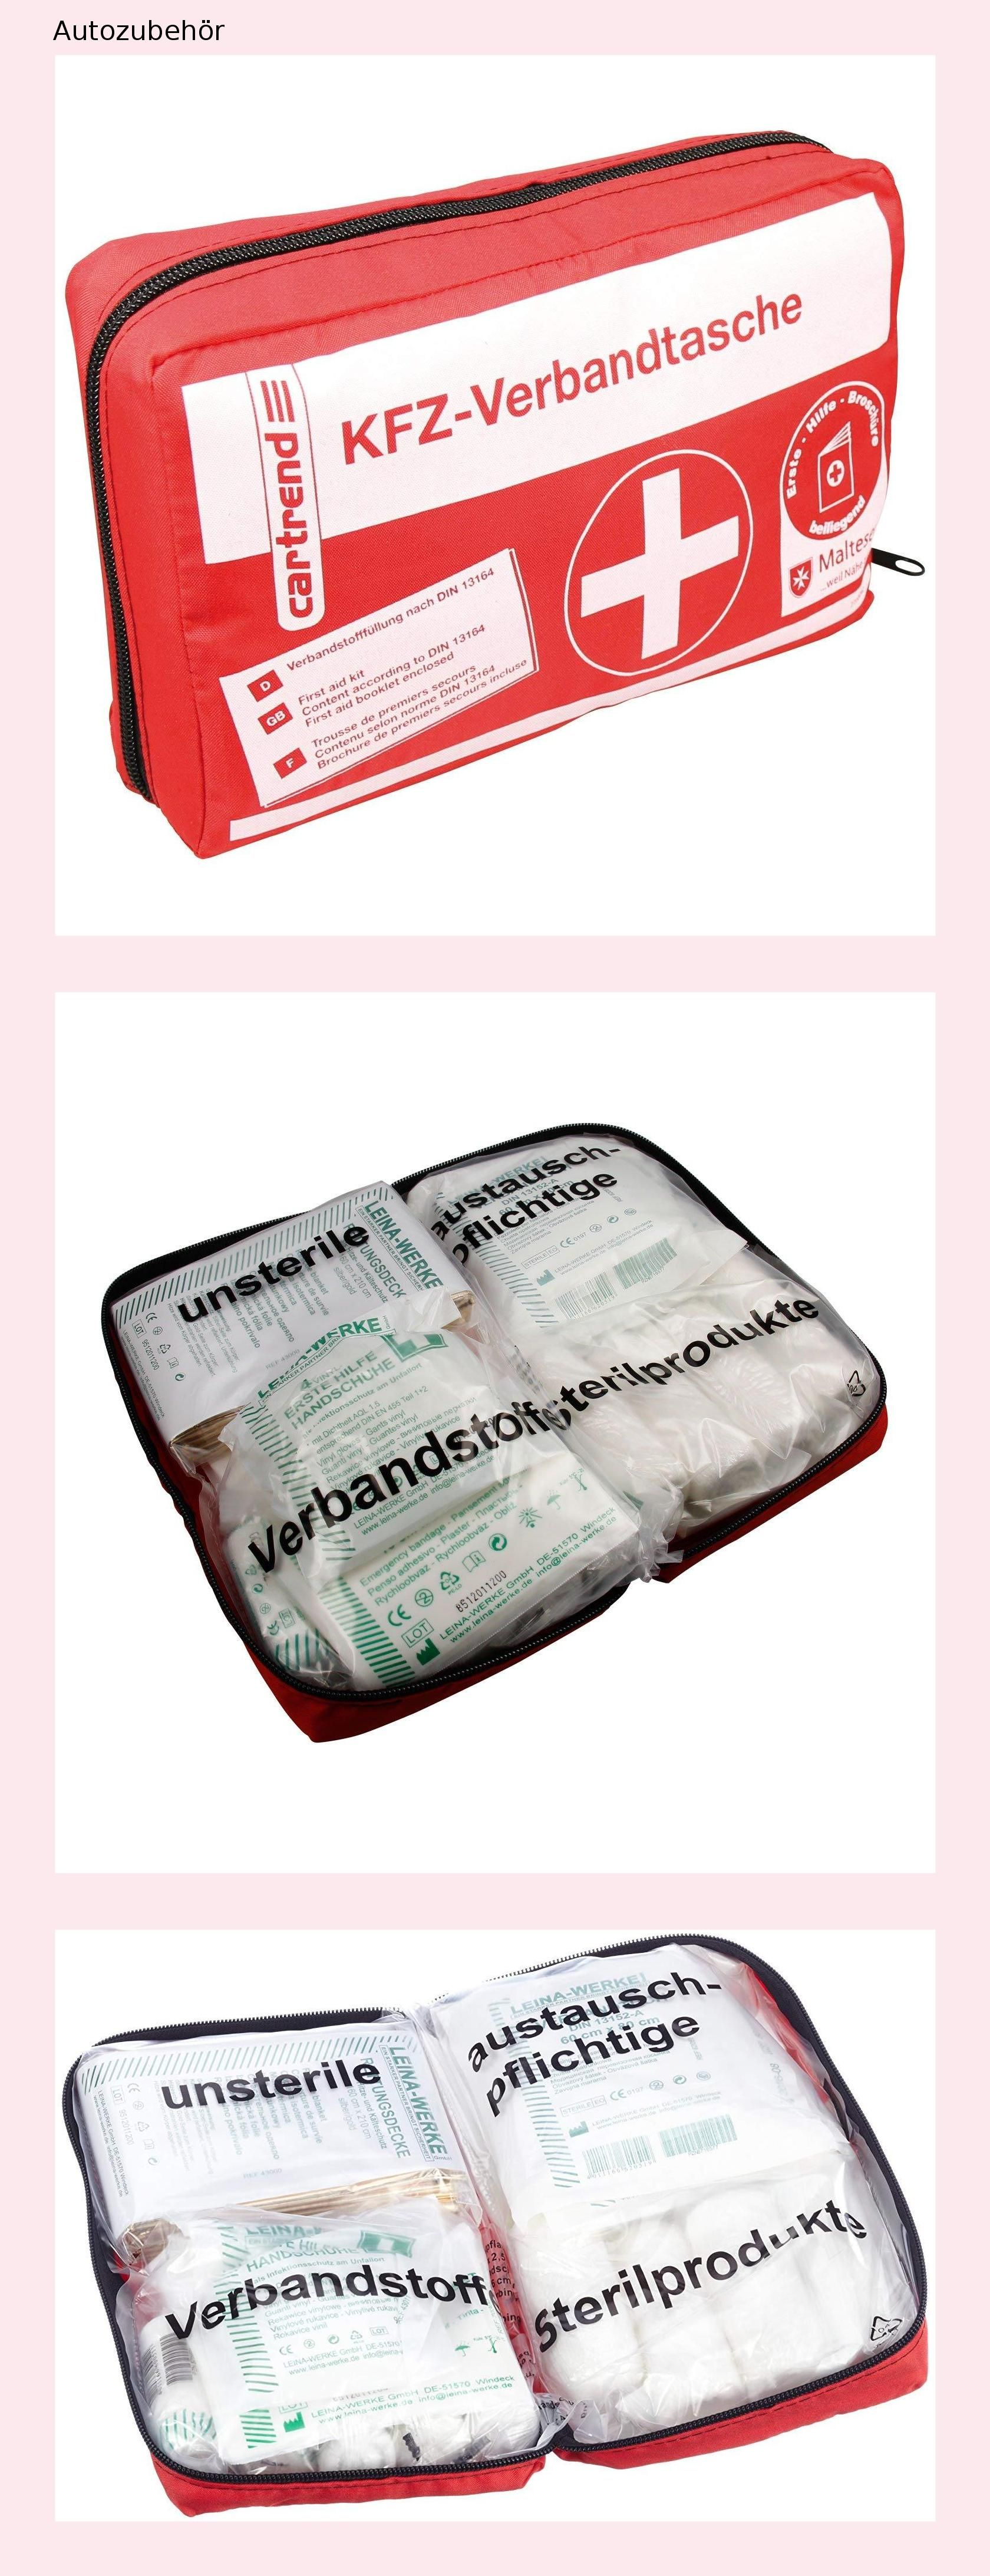 Cartrend Kombitasche Warndreieck Verbandtasche Malteser Erste-Hilfe-Set